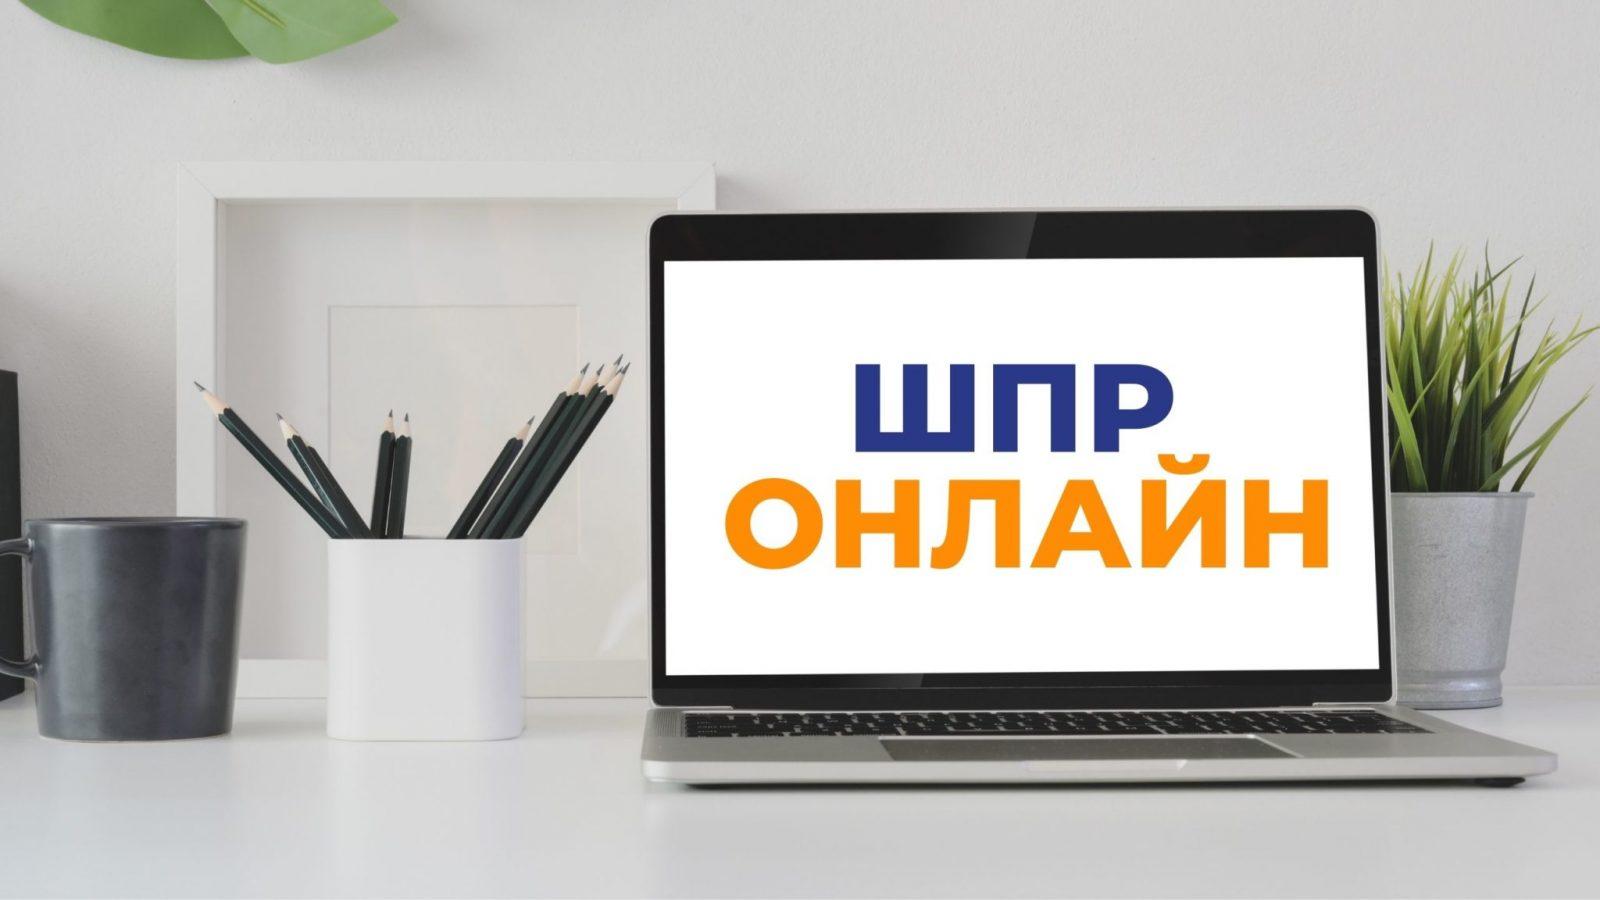 ШПР 81 (онлайн)